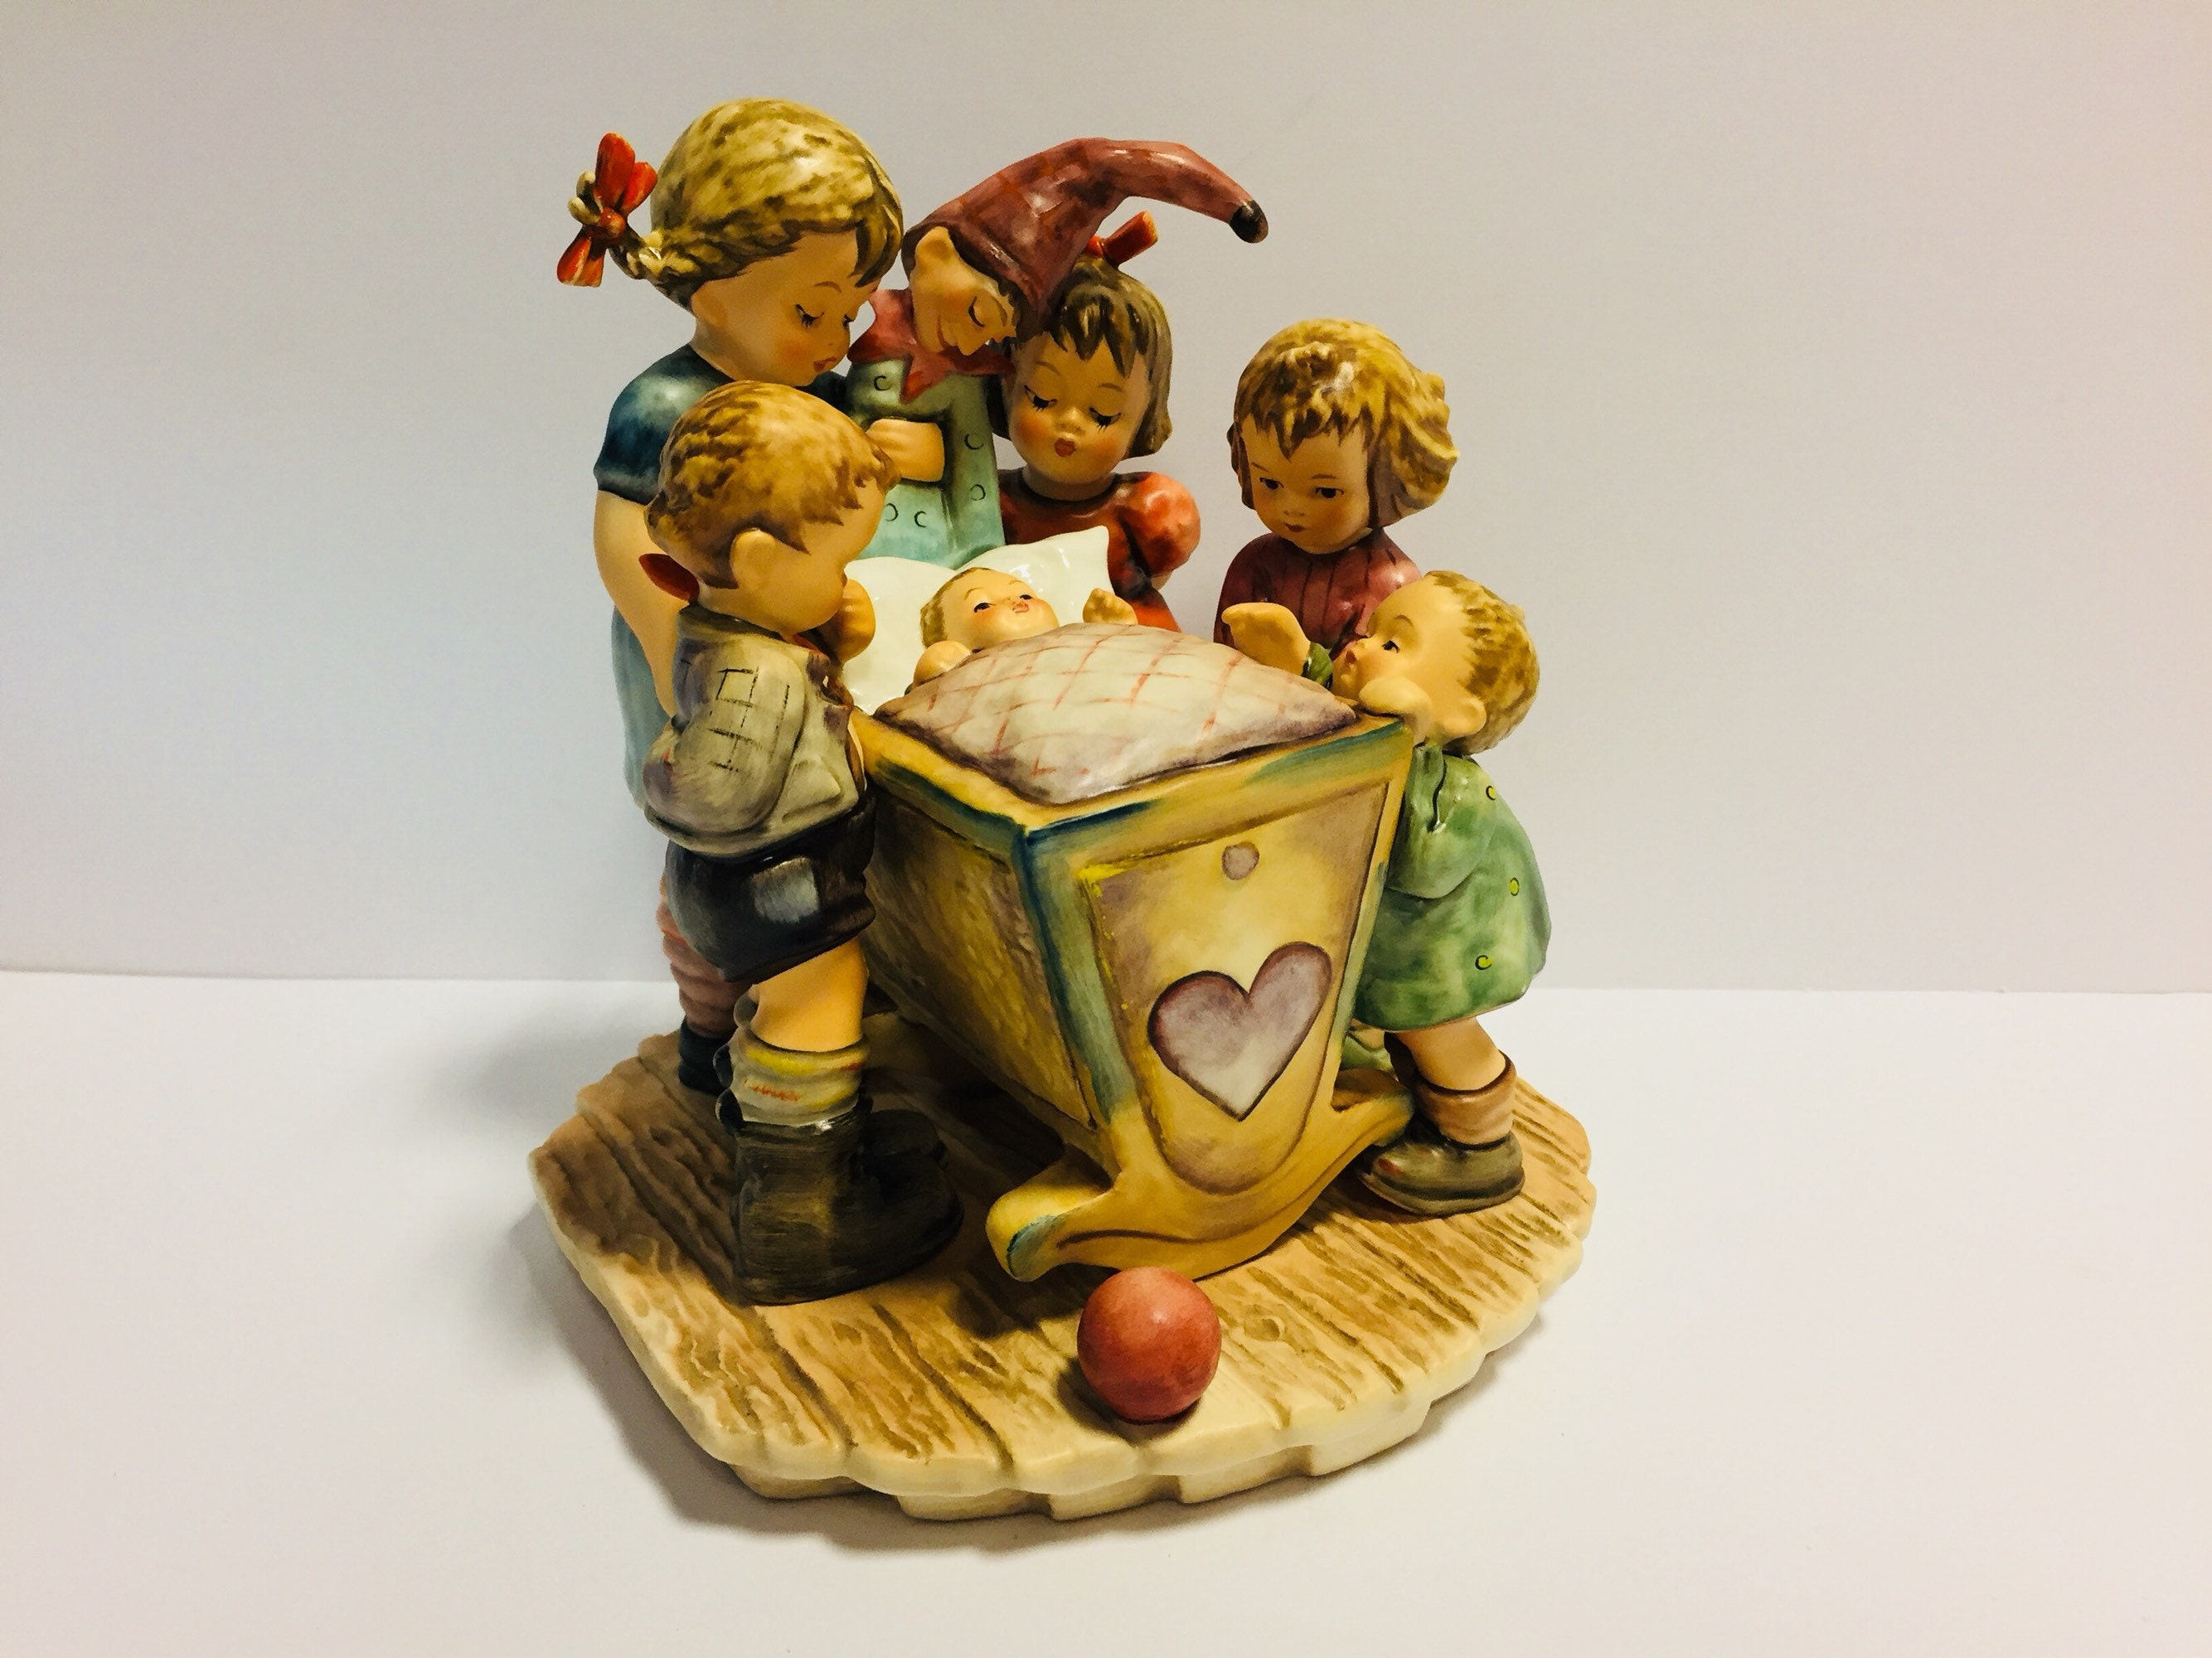 Hummel Rock-A Bye-Figurine, LARGE Hummel Figurine, Hummel Century Collection, 7 1/2 Inches Tall, TMK 7, Hummel Figure 574